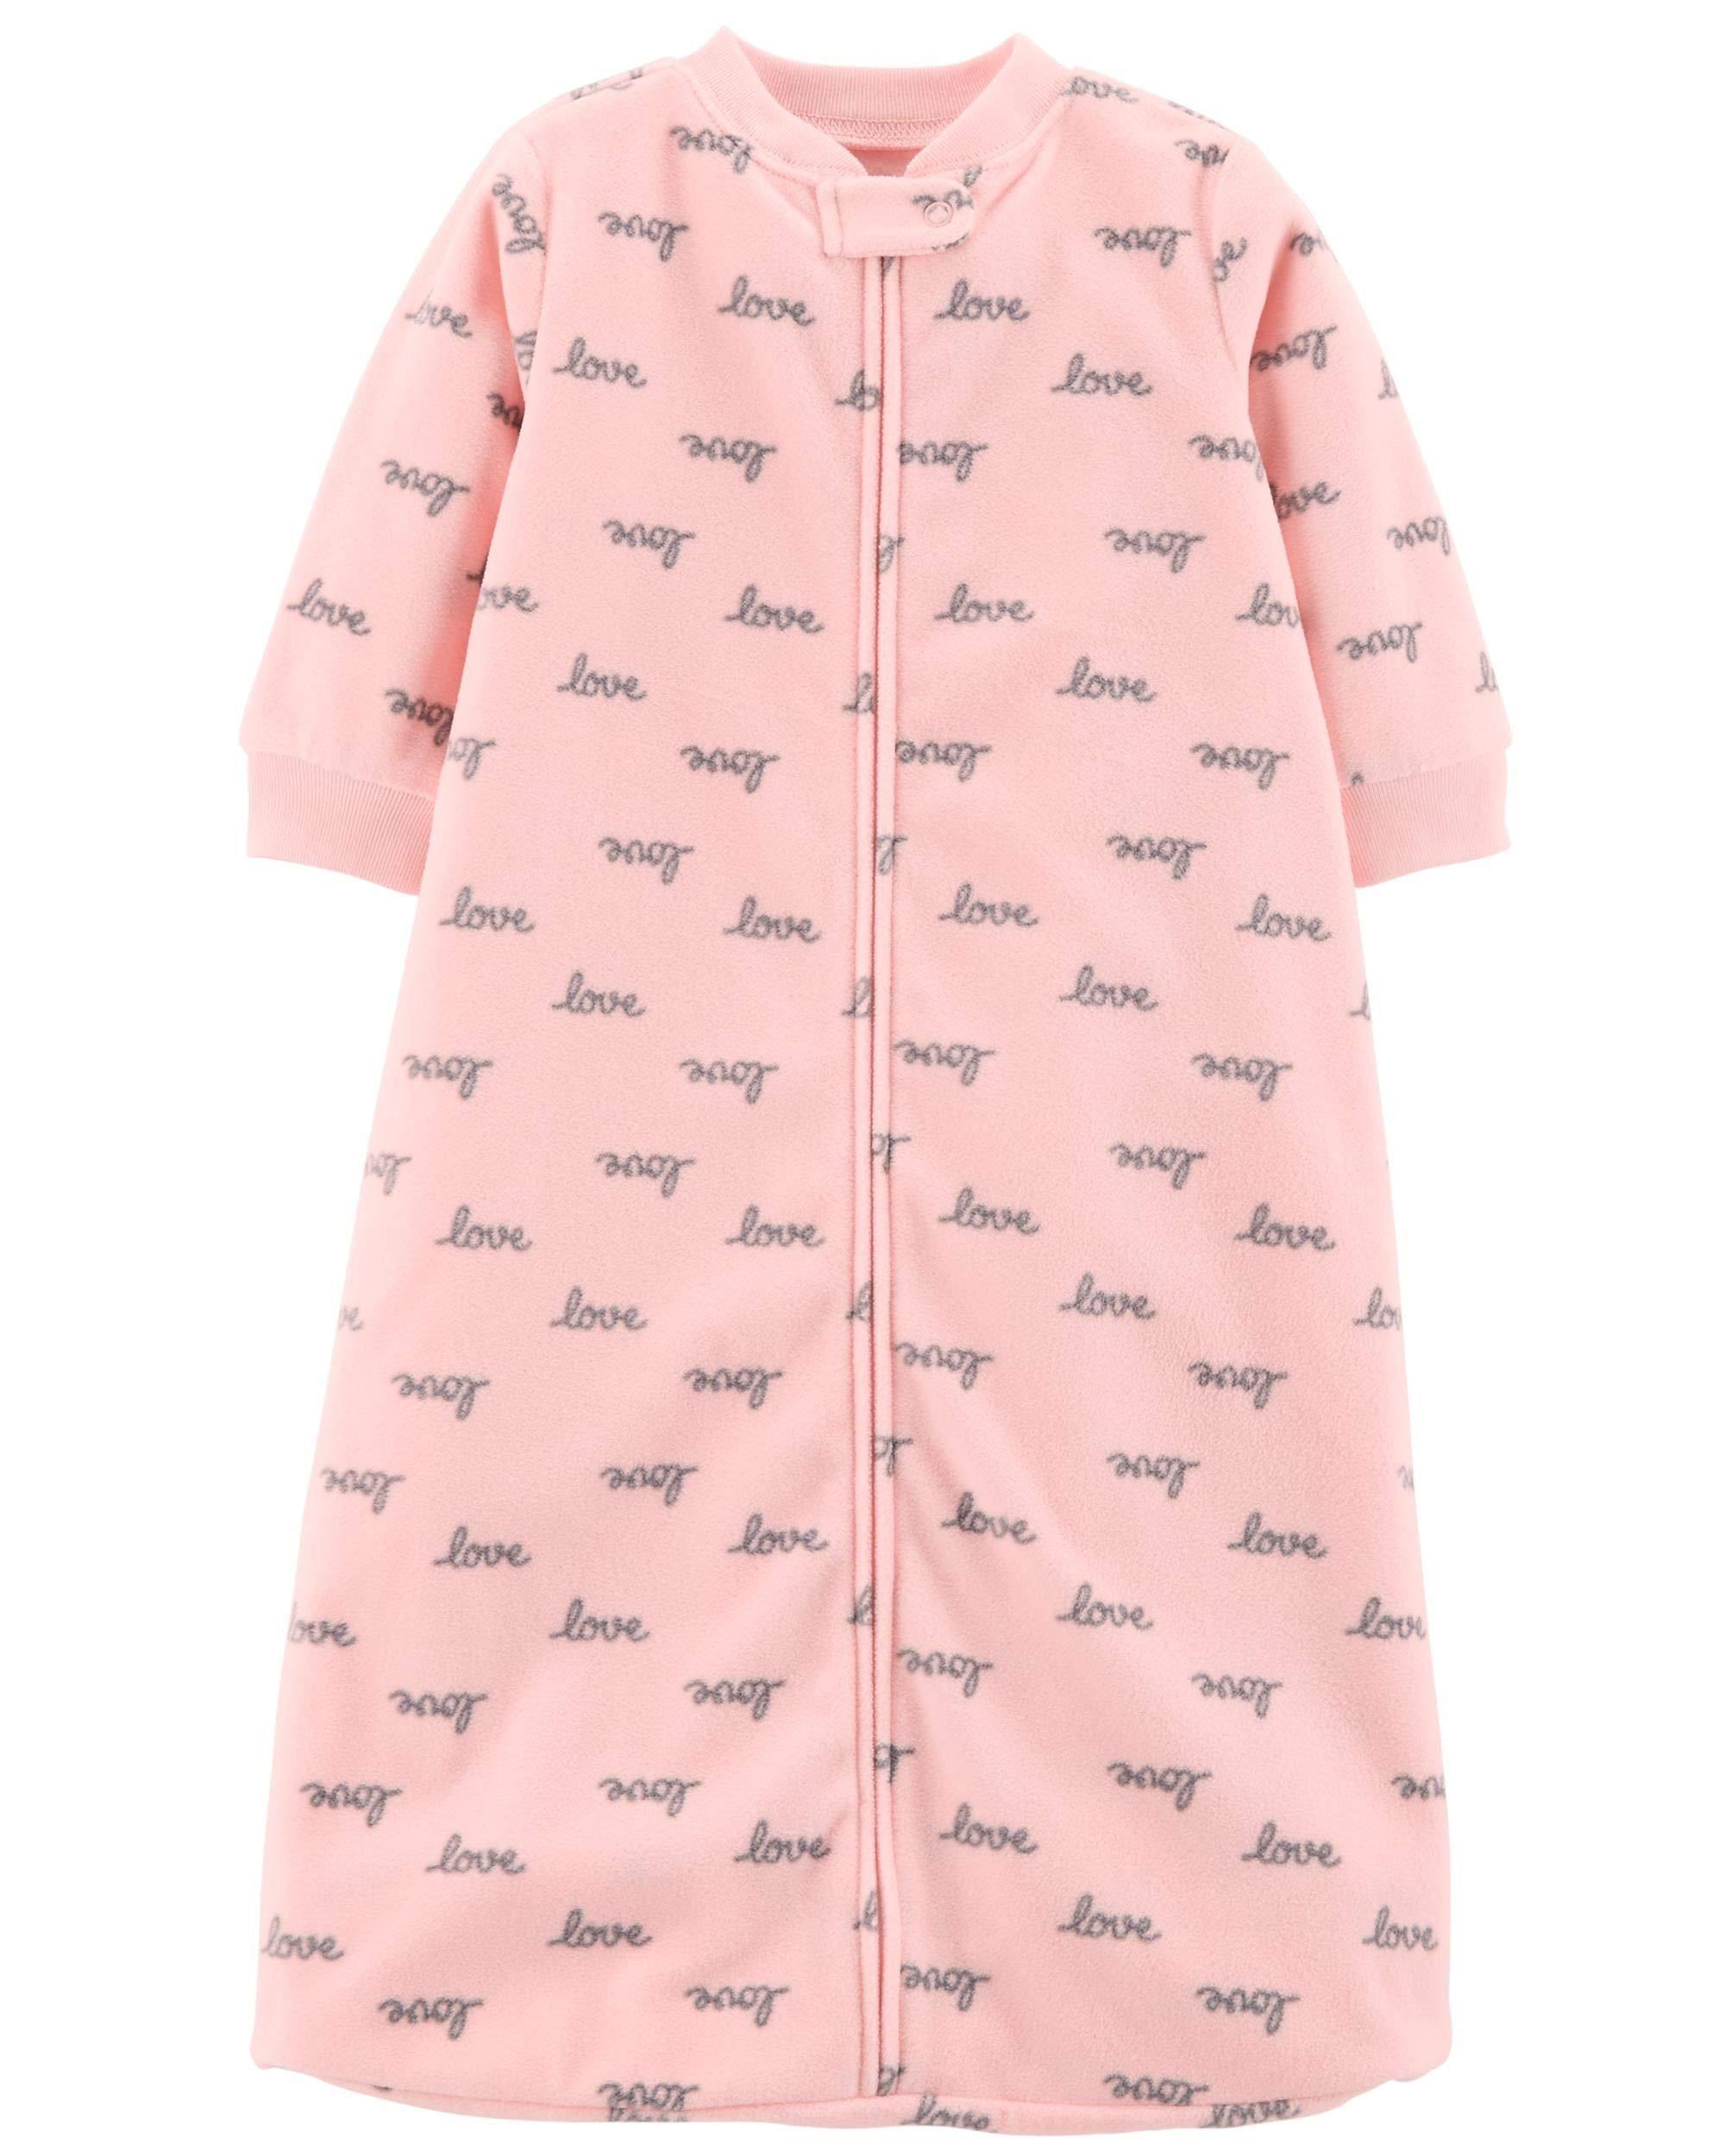 Carter's Unisex Baby Fleece Sleepbag Sleepsuit, Pink Love, Medium 6-9 Months